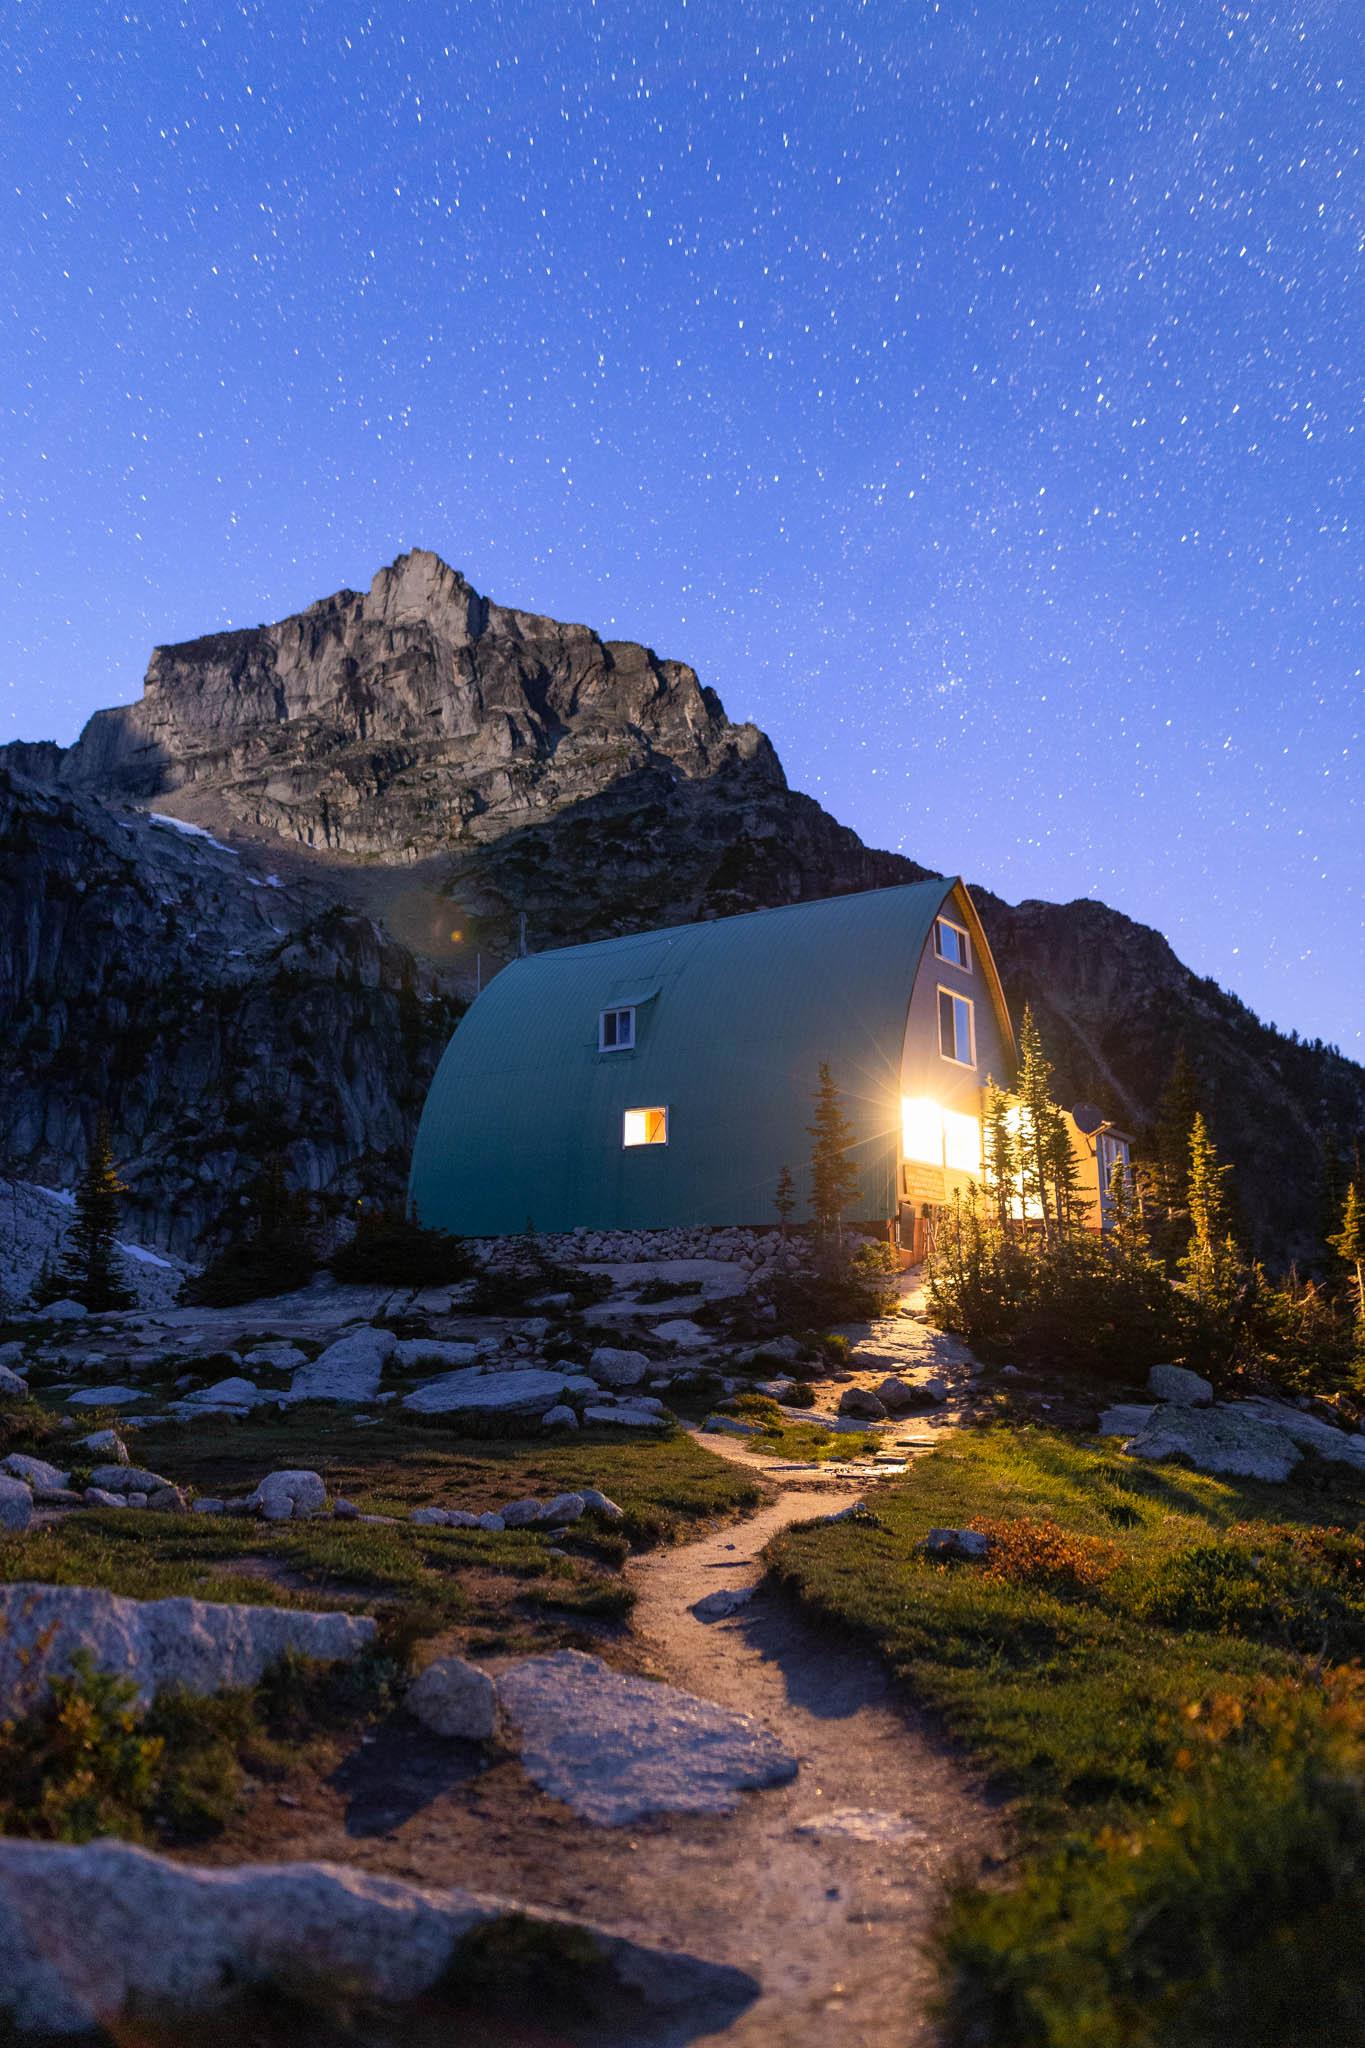 Conrad Kain Hut under the stars.